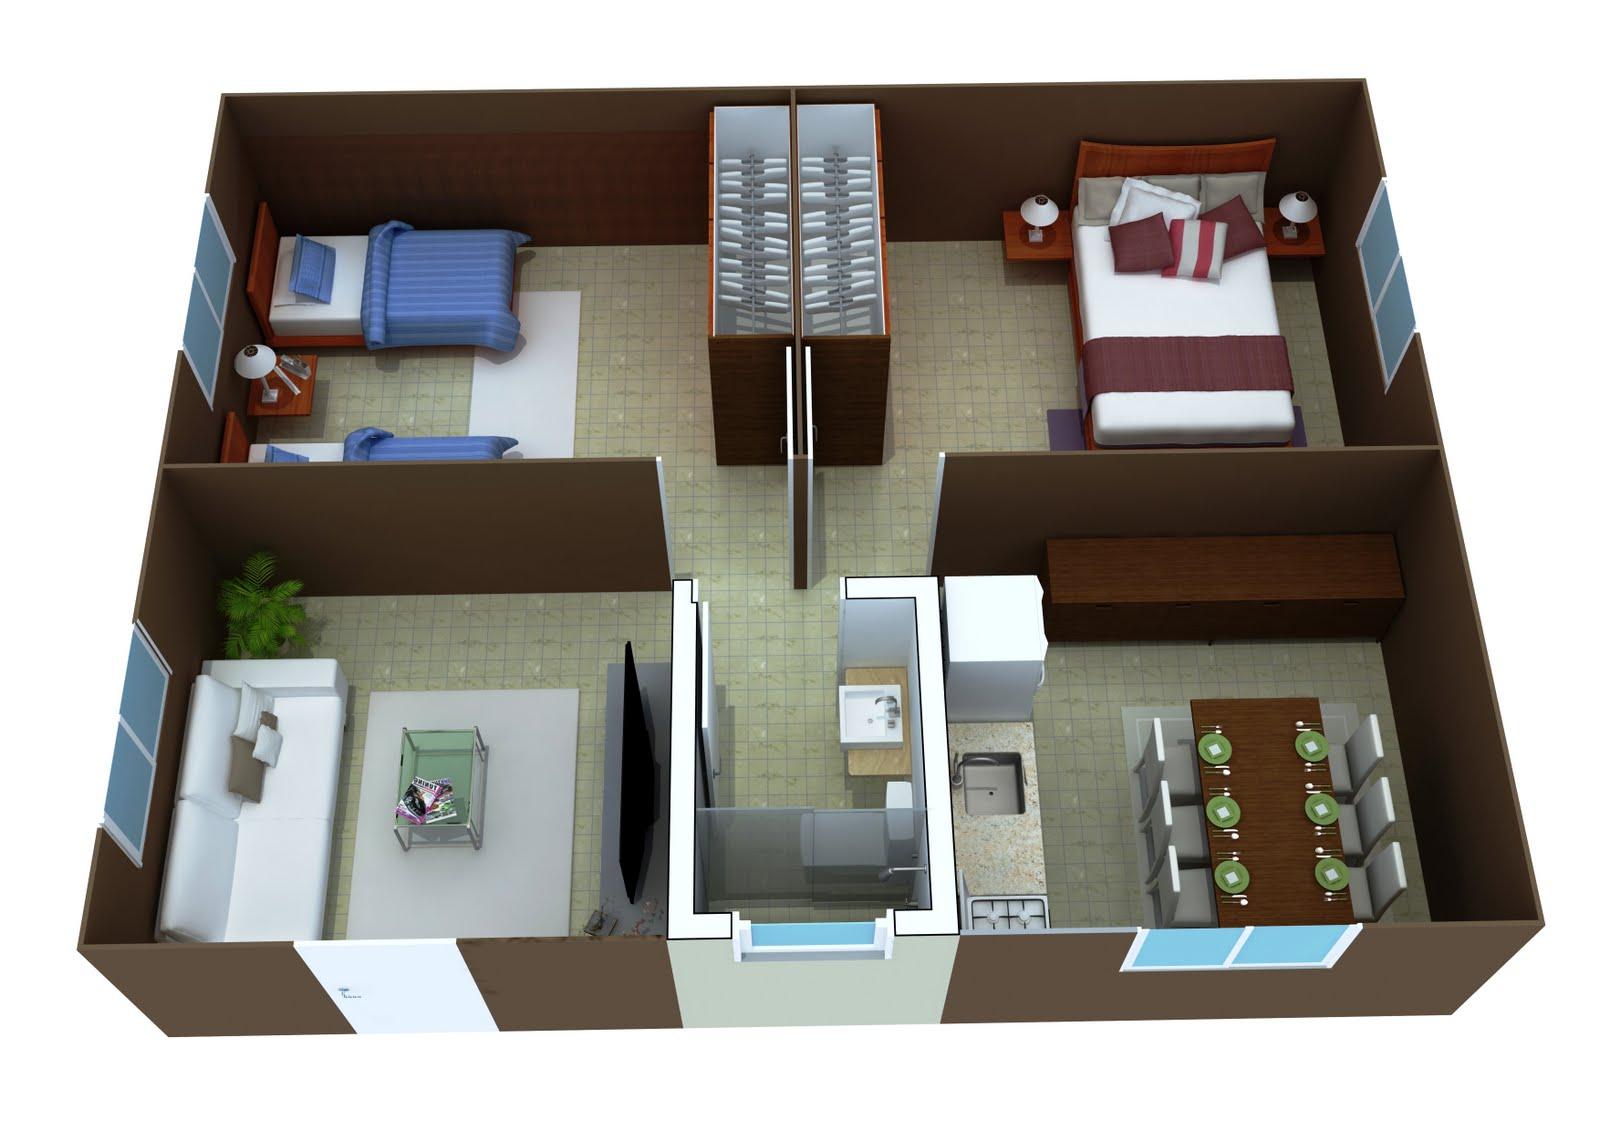 Plantas de Casas: Modelos Planta Baixa Projetos #332418 1600 1131